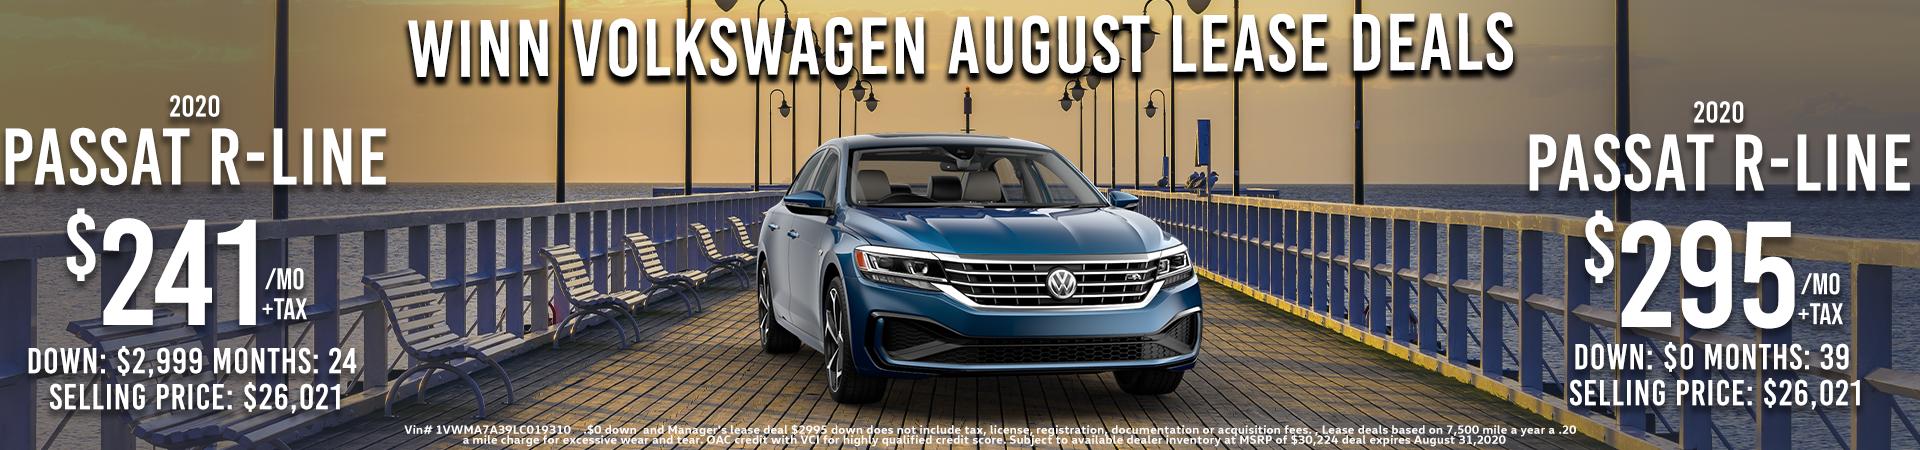 VW August Jetta Lease deals, Fremont, Milpitas, Union City, San Jose, Santa Clara, Stevens Creek, Sunnyvale, San Leandro , Hayward, Redwood City, Mountainview, , Bay area